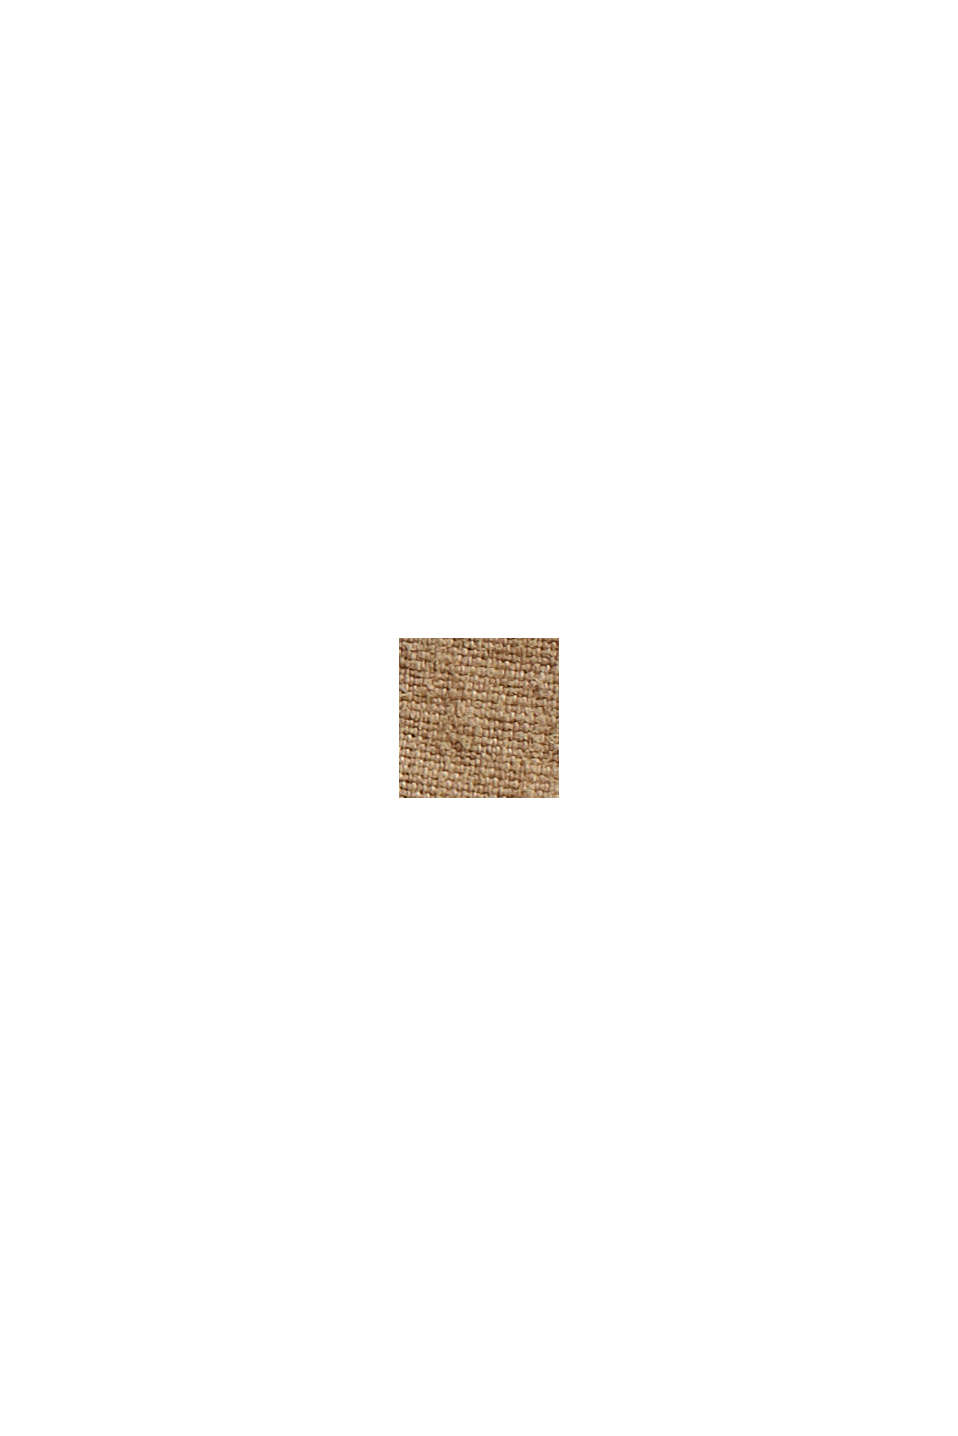 Hampamix: Shorts med paperbag-linning, SAND, swatch